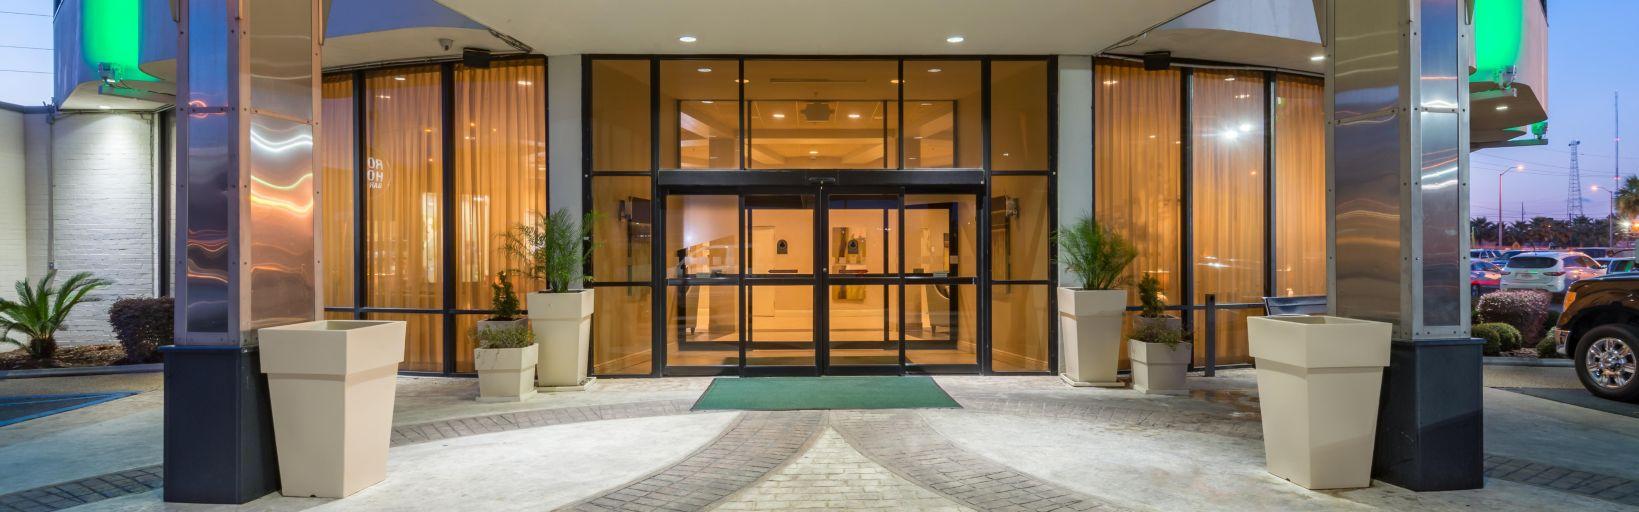 Hotel-Entrance.jpg